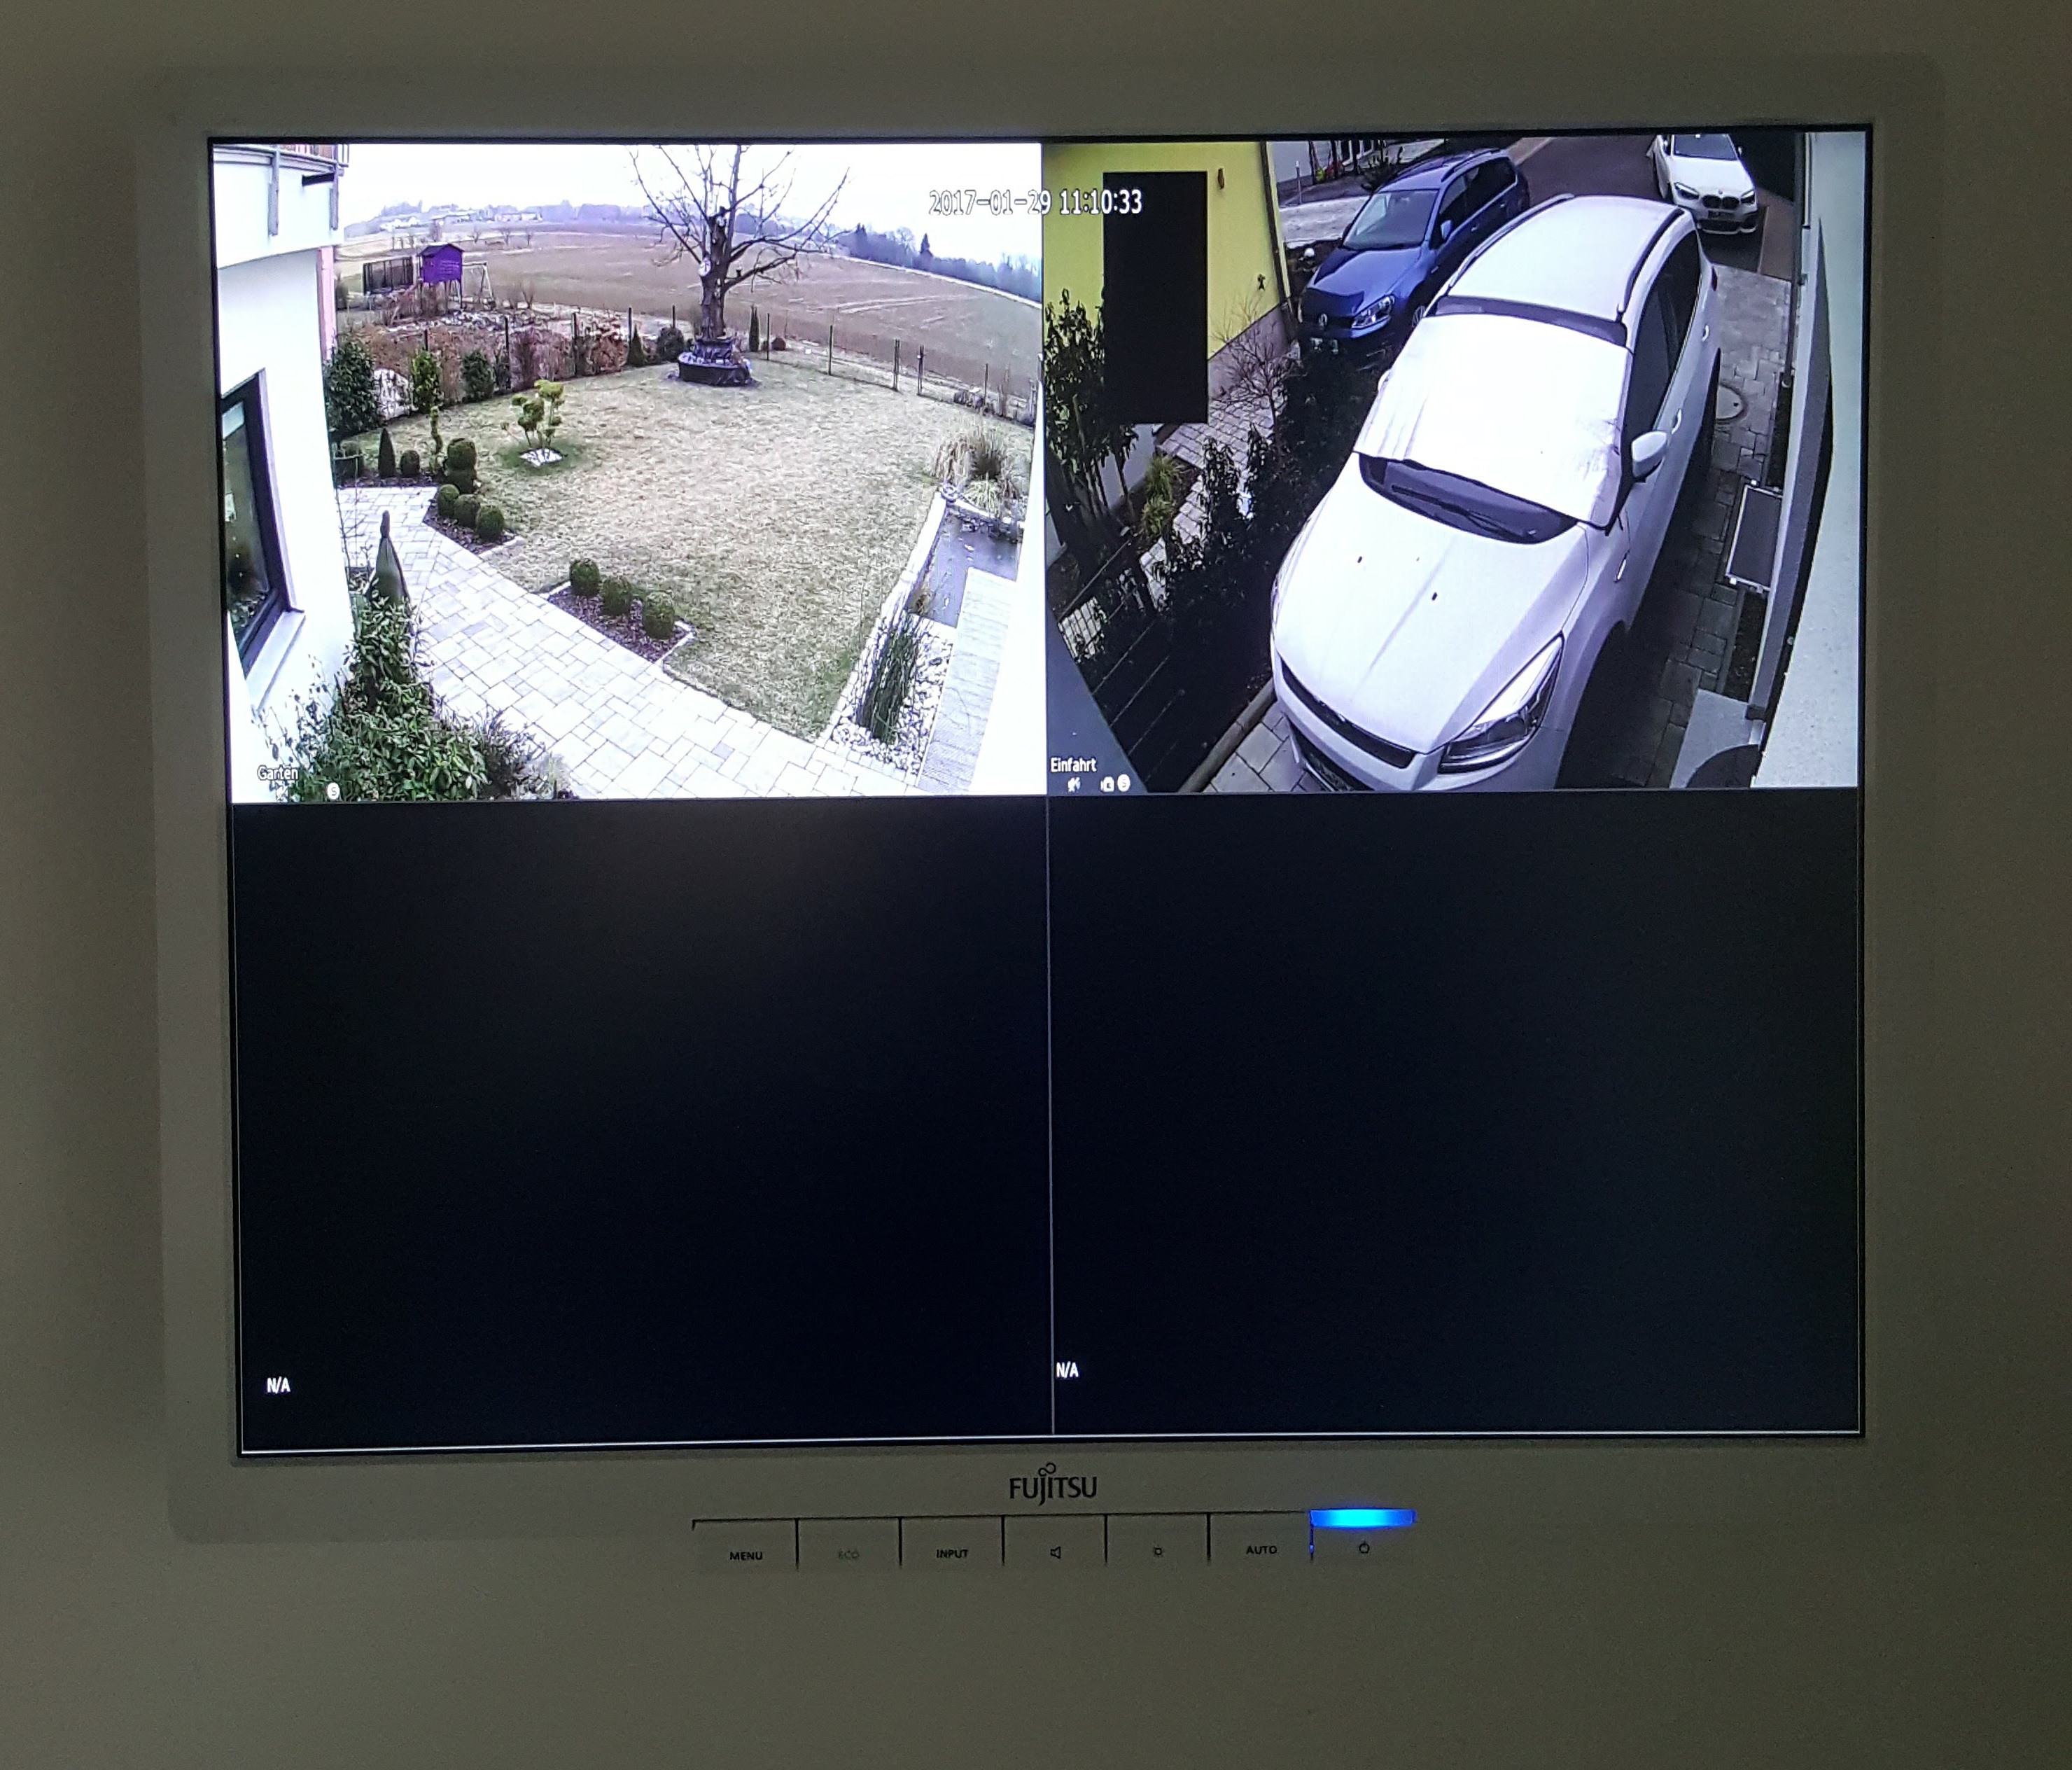 kombination kamera system und gegensprechanlage – bach electronic